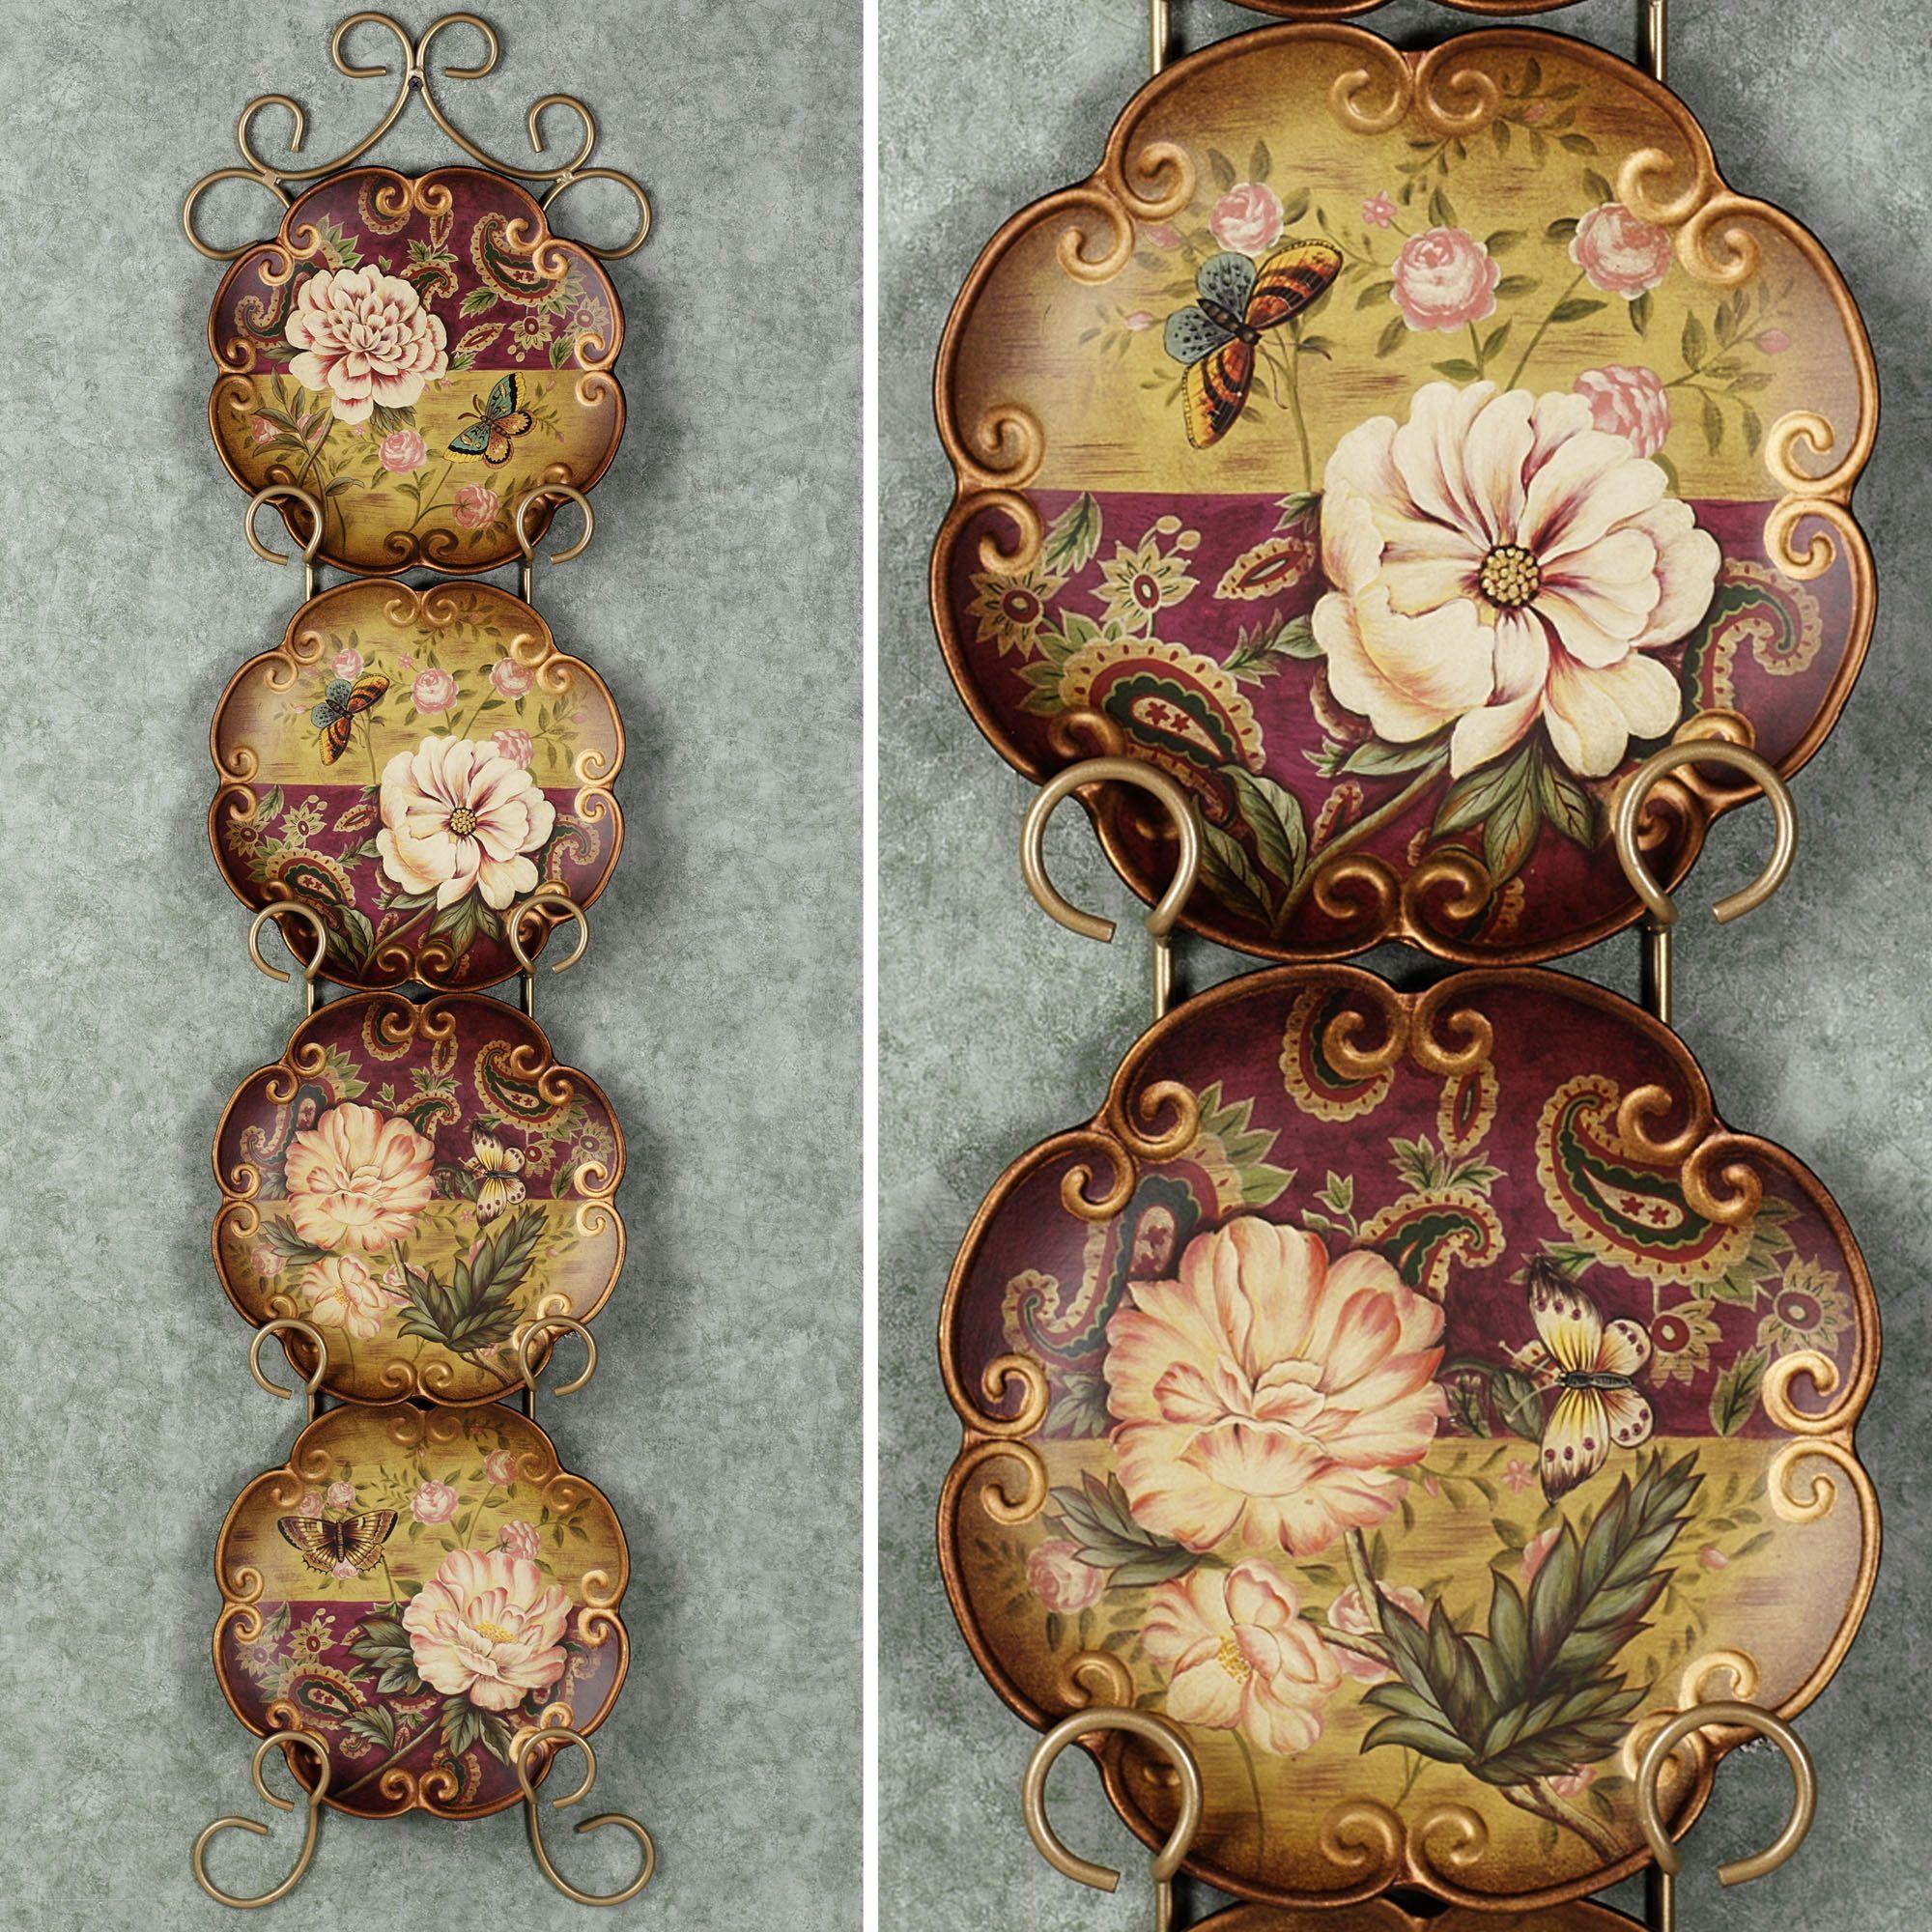 Charming Natures Beauty Decorative Ceramic Plate Set